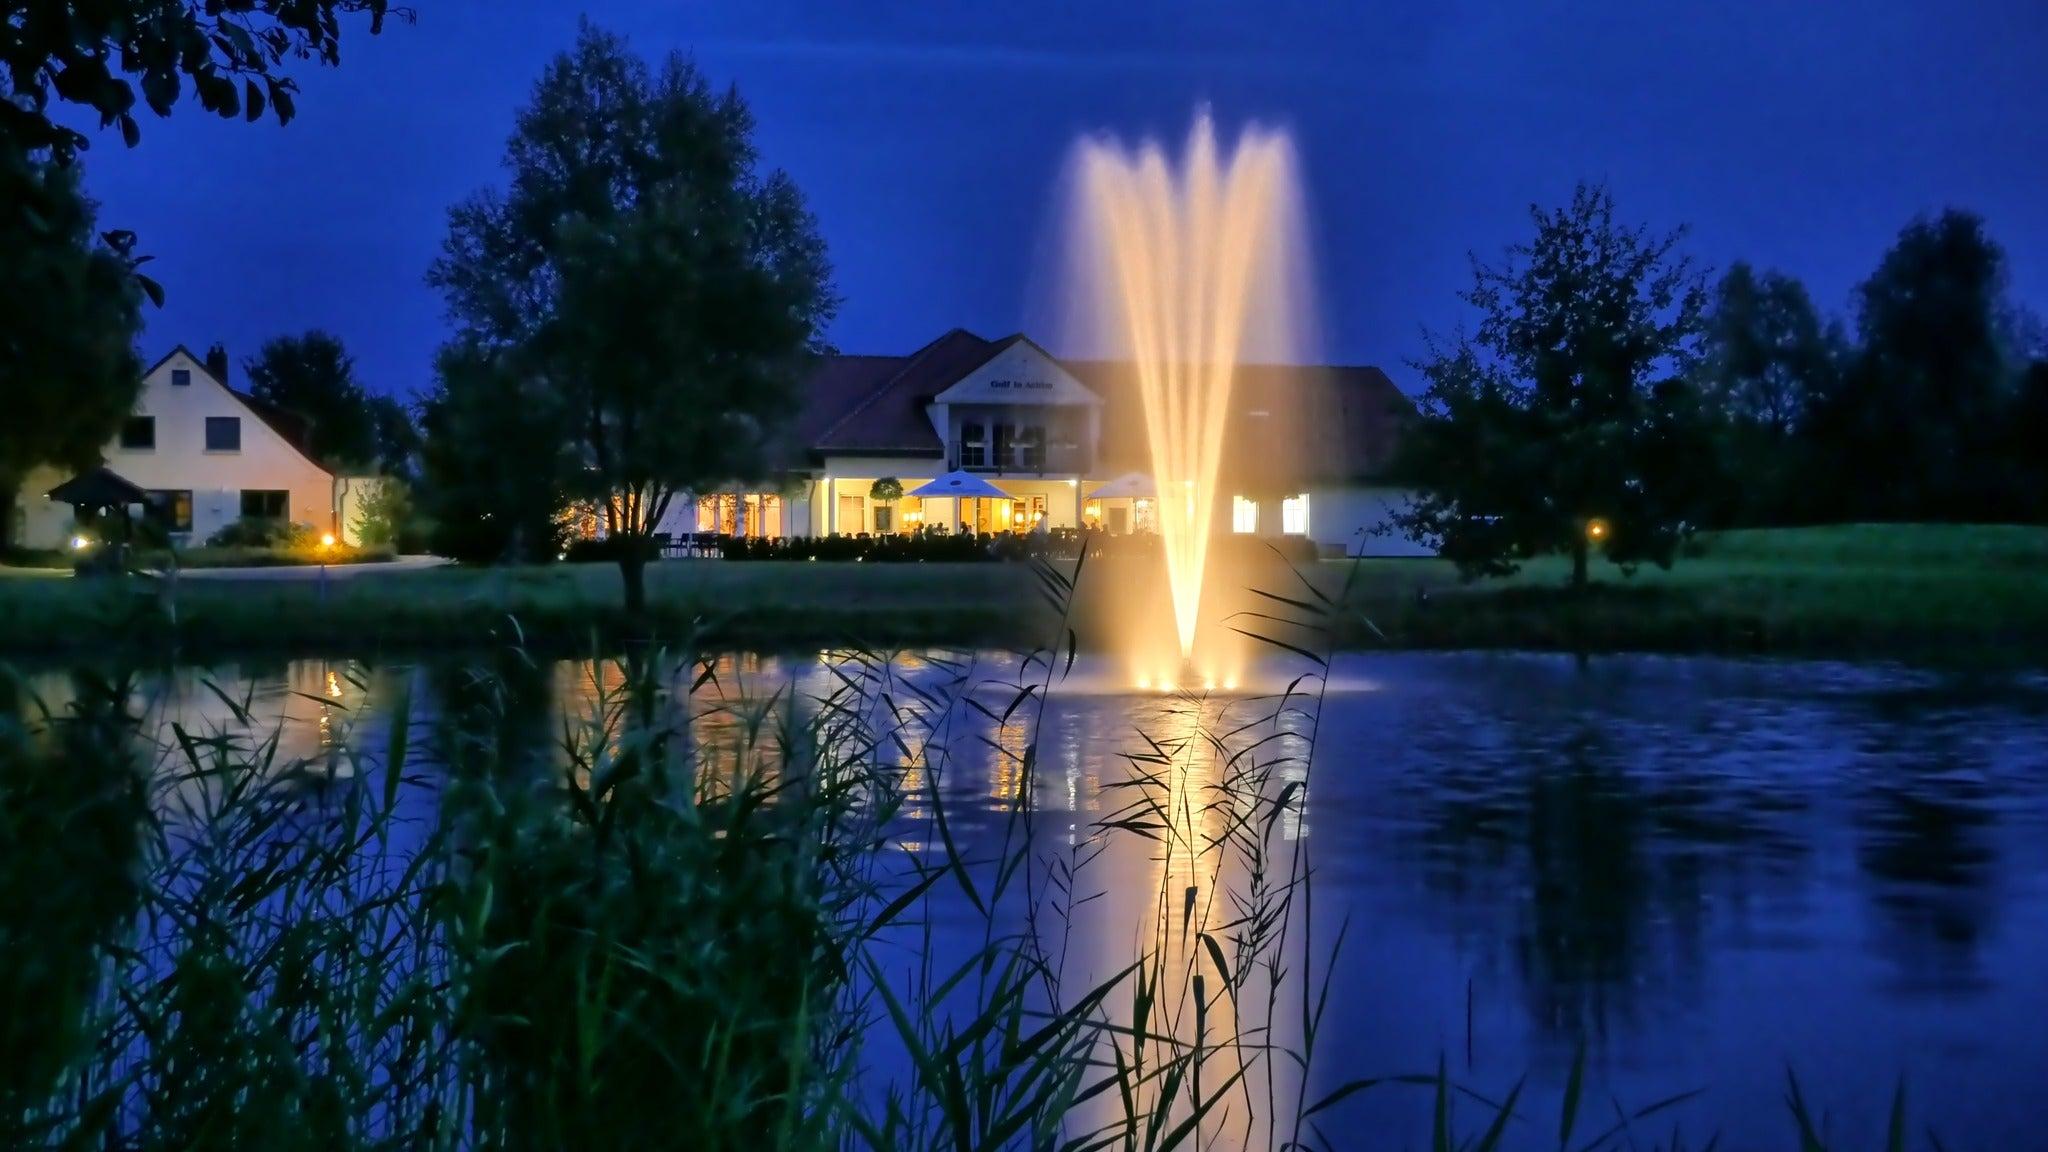 Sommernachtstraum - Das Open Air Kino am See